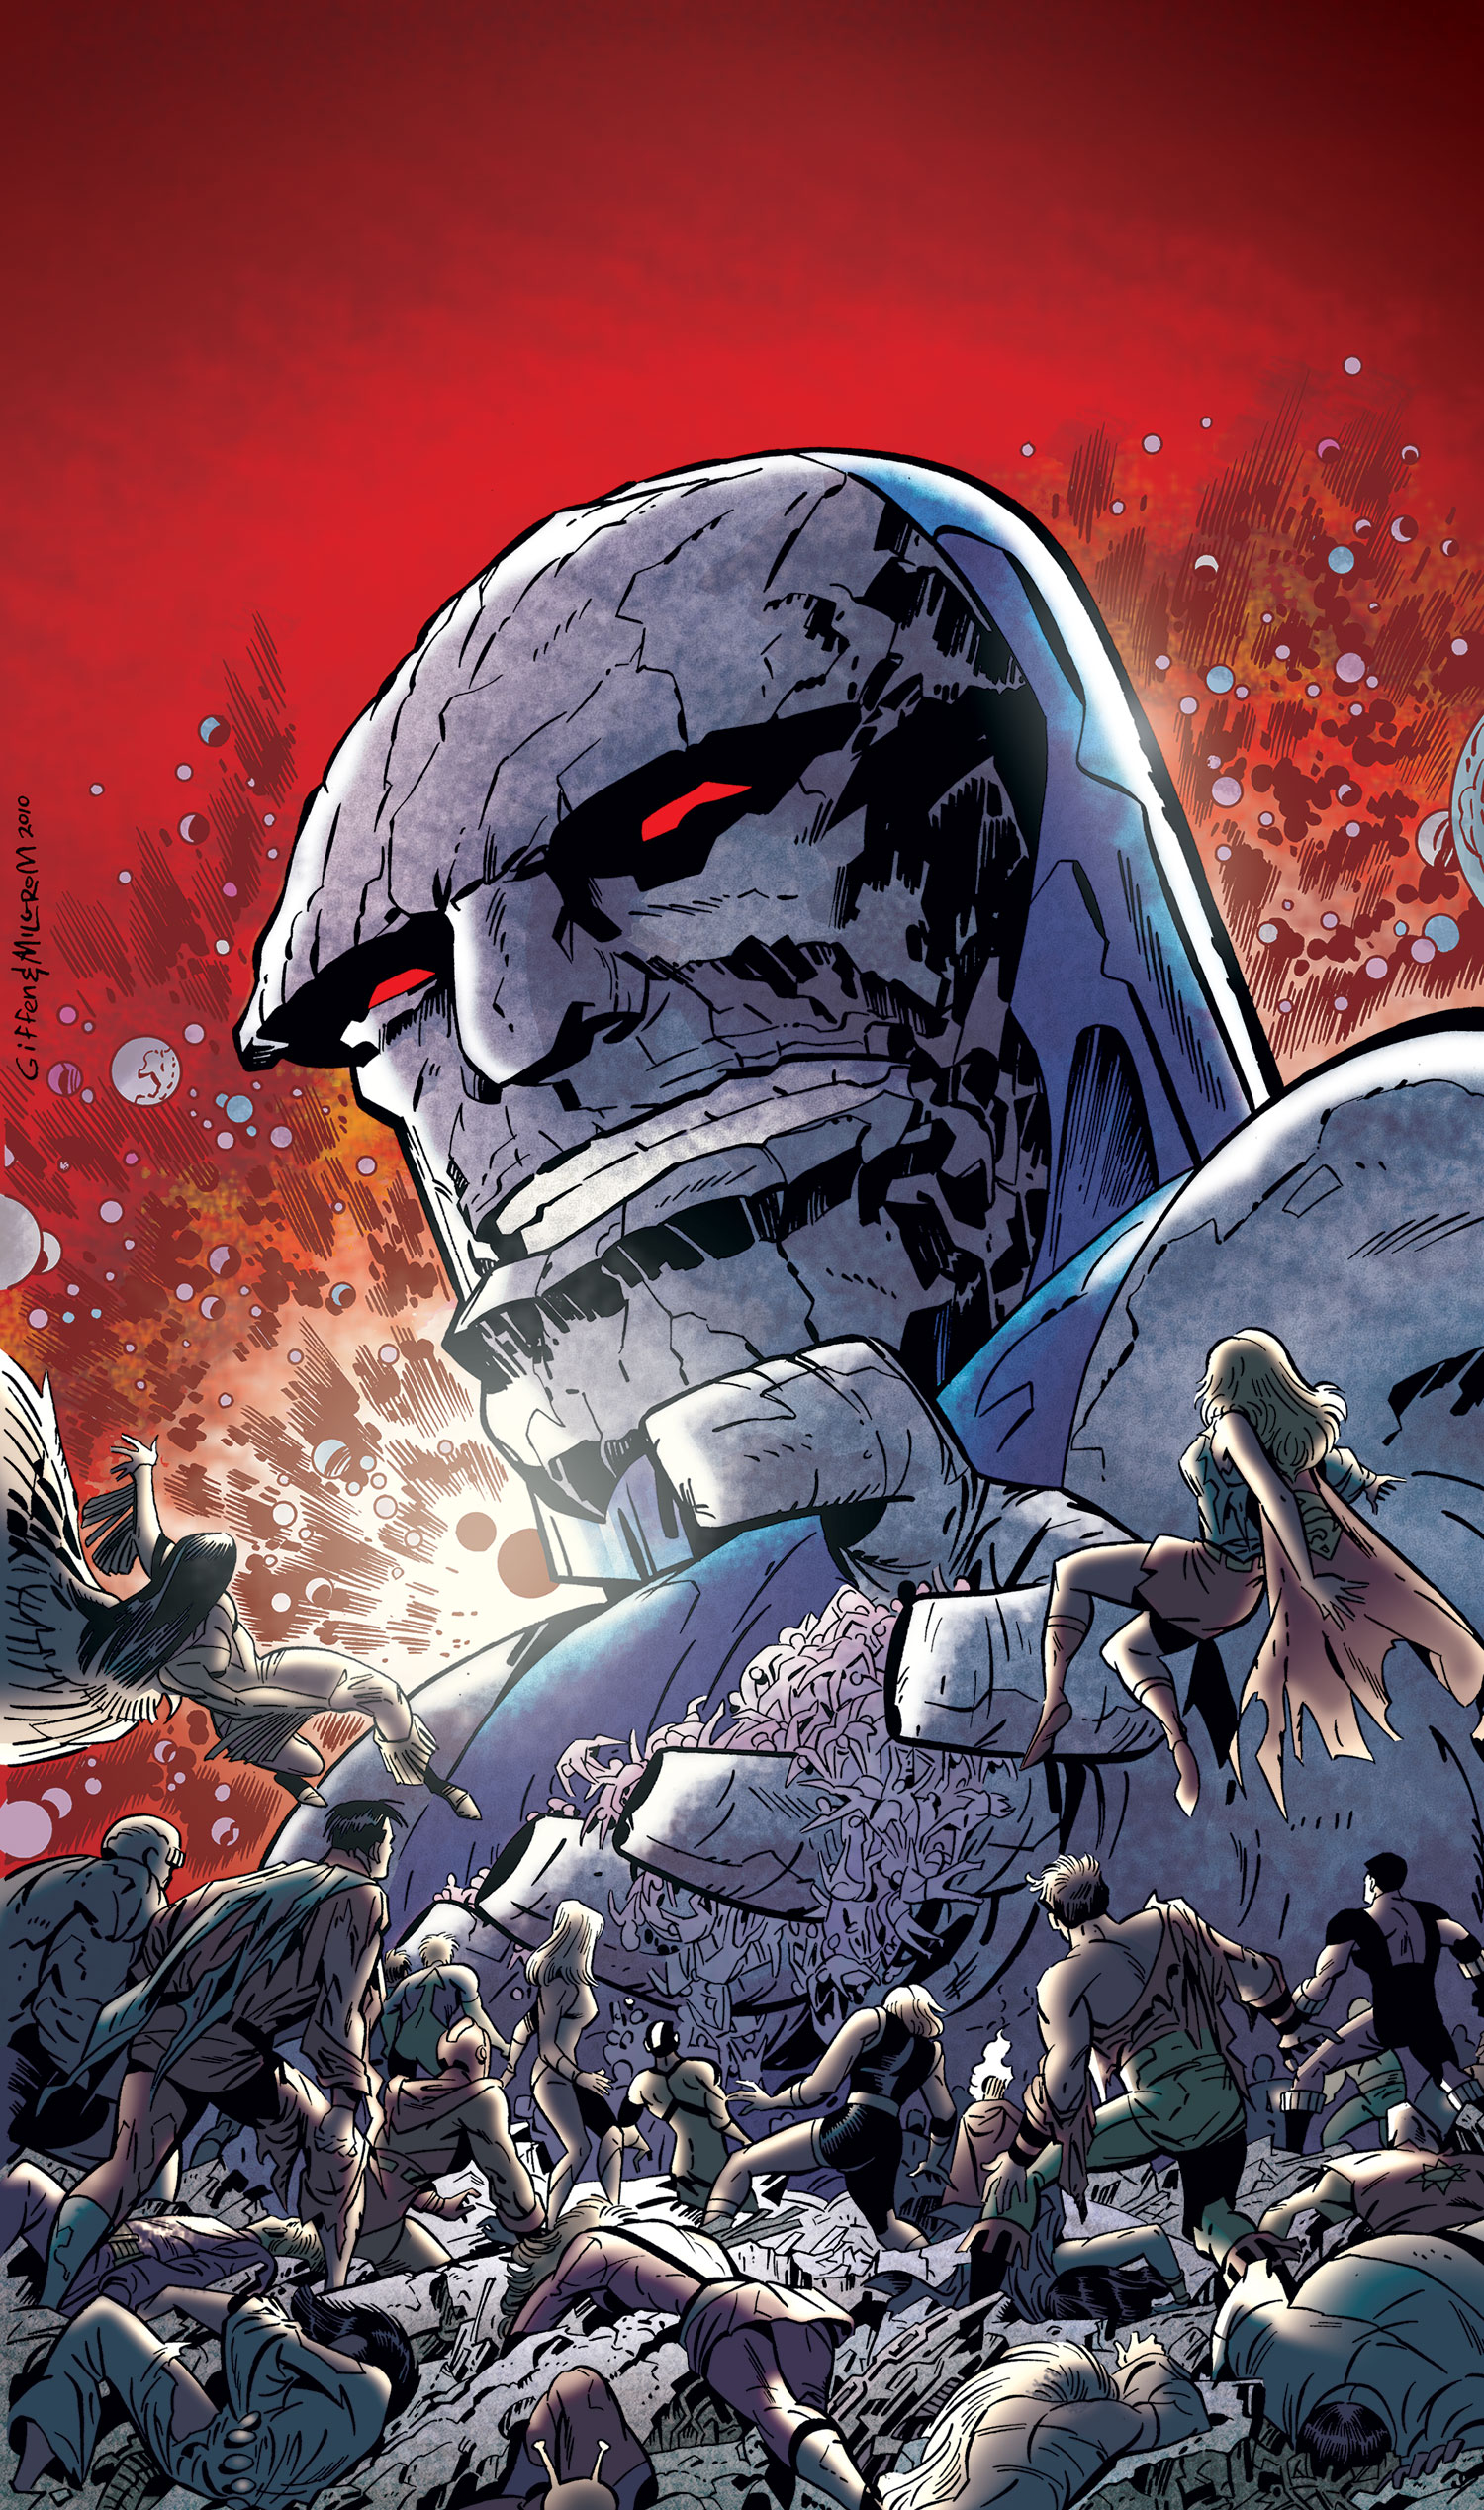 Legion of Super-Heroes The Great Darkness Saga Textless.jpg